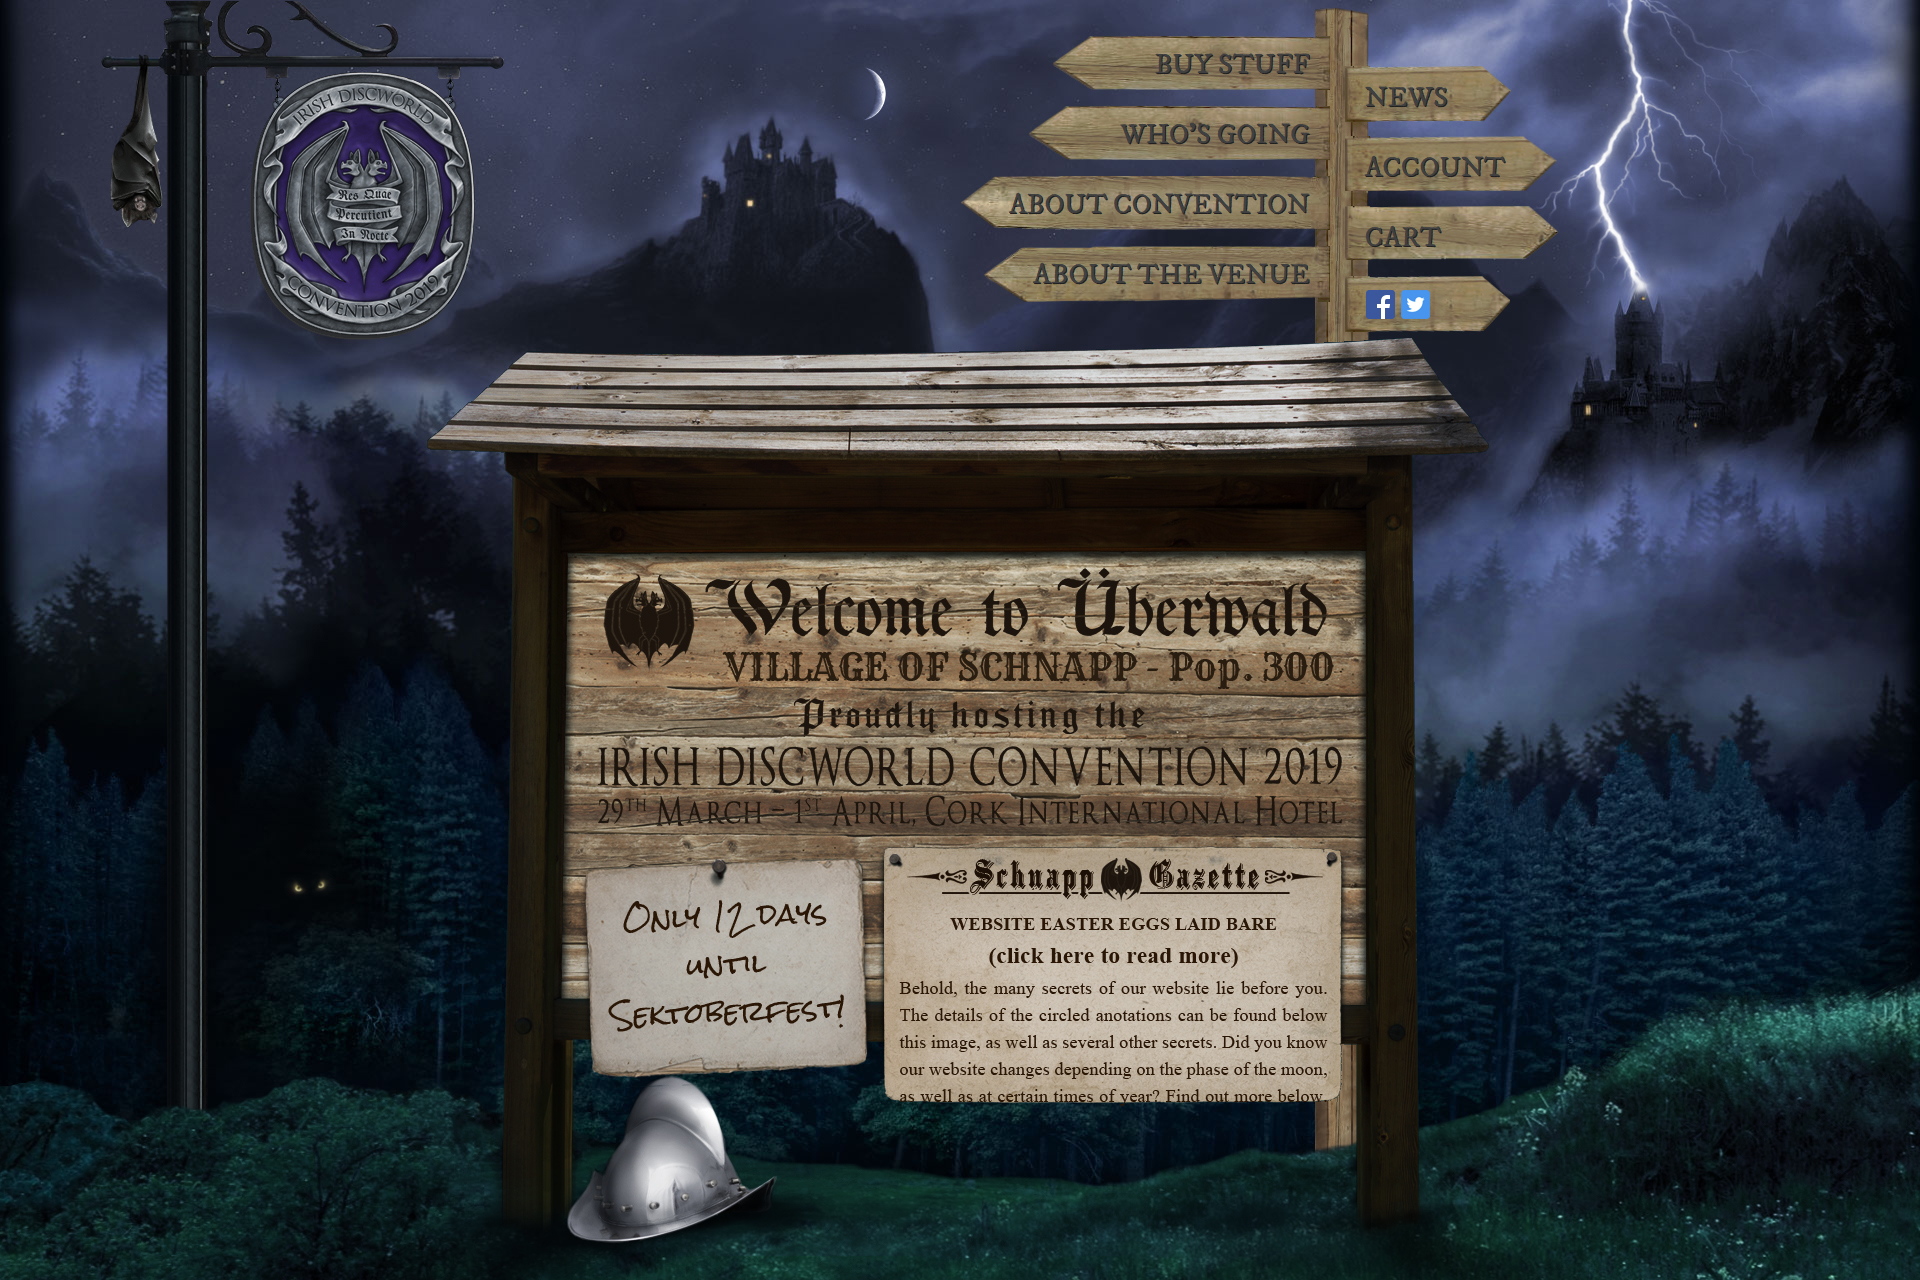 UK Discworld Convention